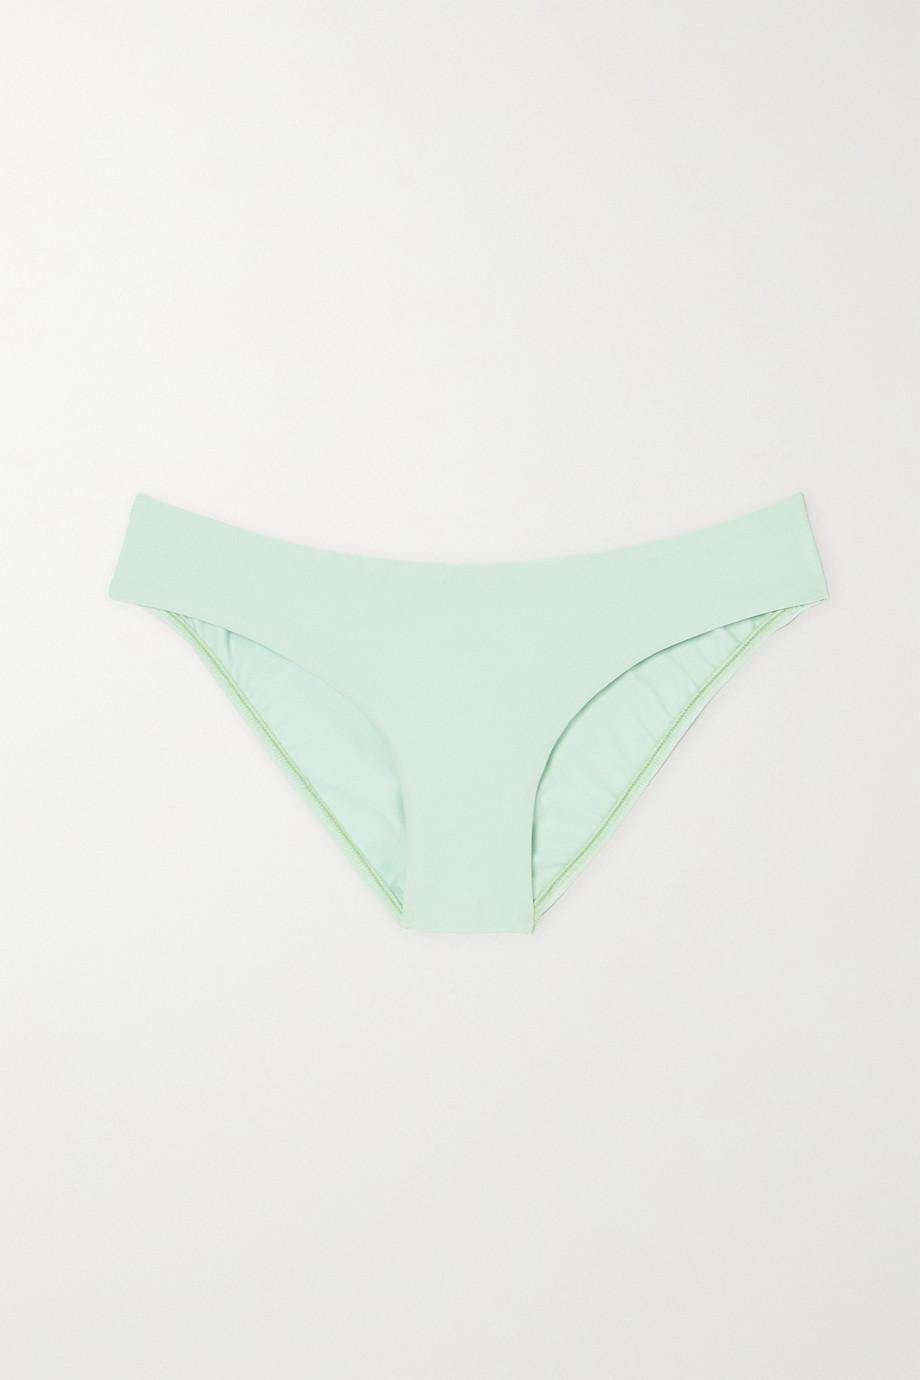 BONDI BORN + NET SUSTAIN x LG Electronics Nadia bikini briefs